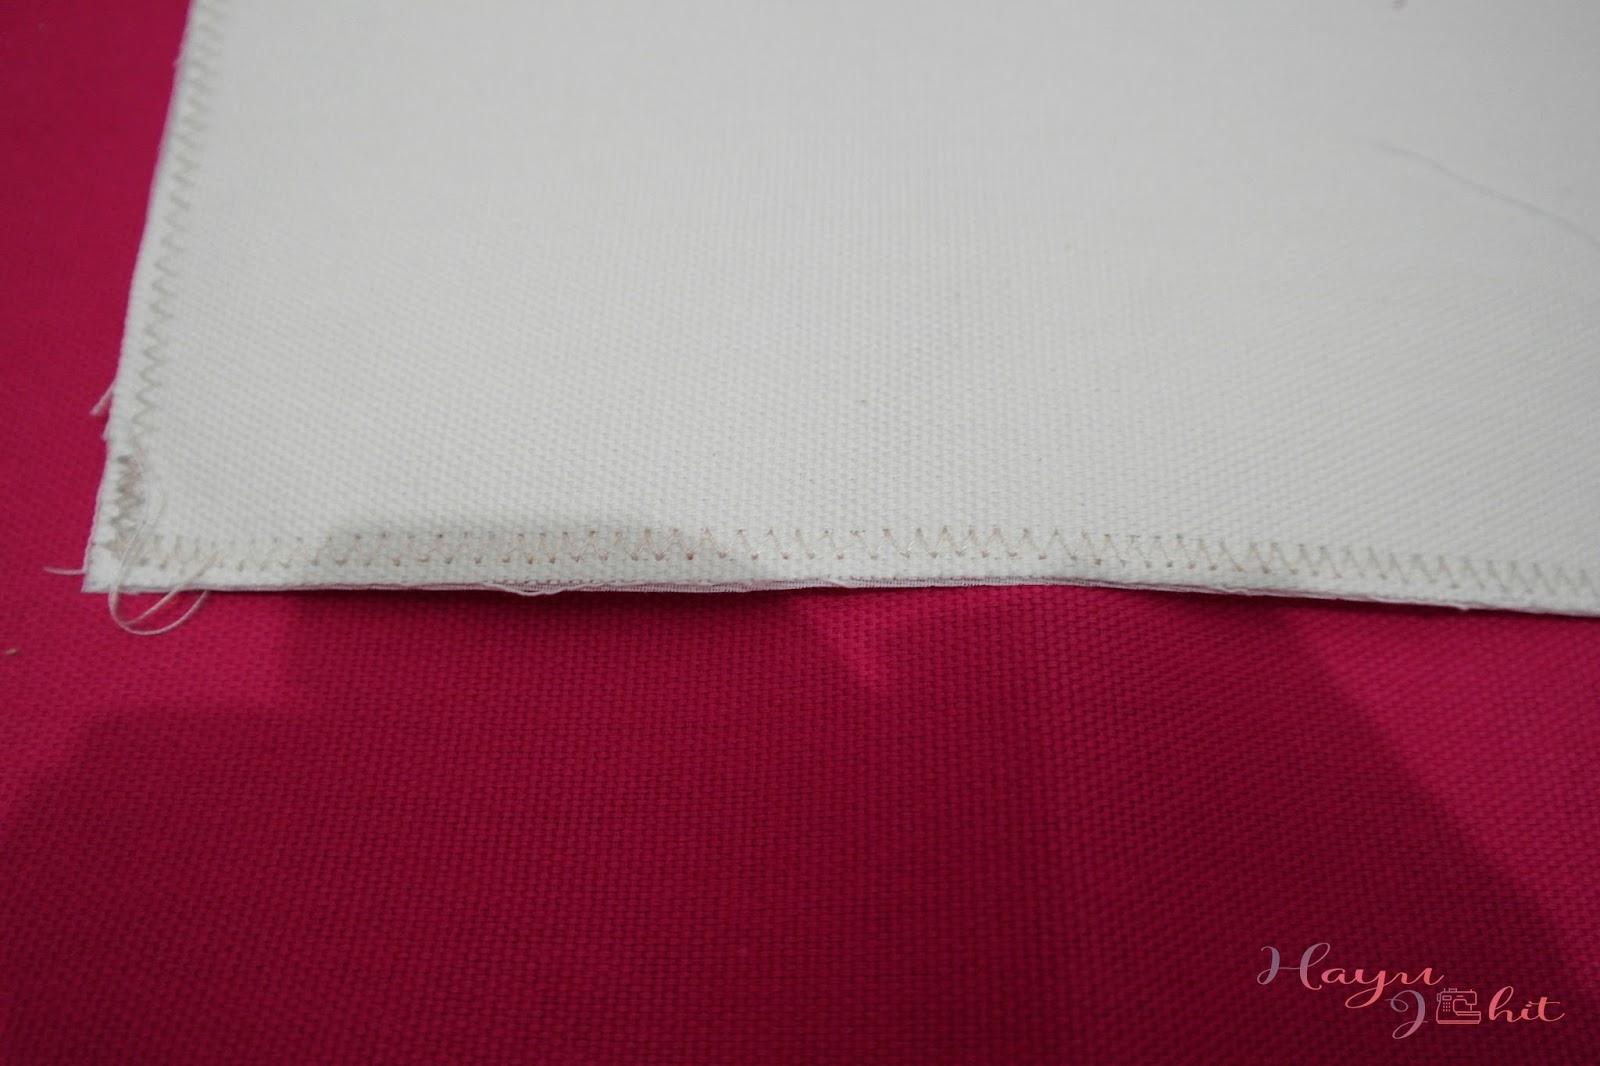 Diy Tutorial Jahit Tempat Pensil Pencil Case With Zipper Hayu Bahan Kanvas Zigzag Pinggiran Kain